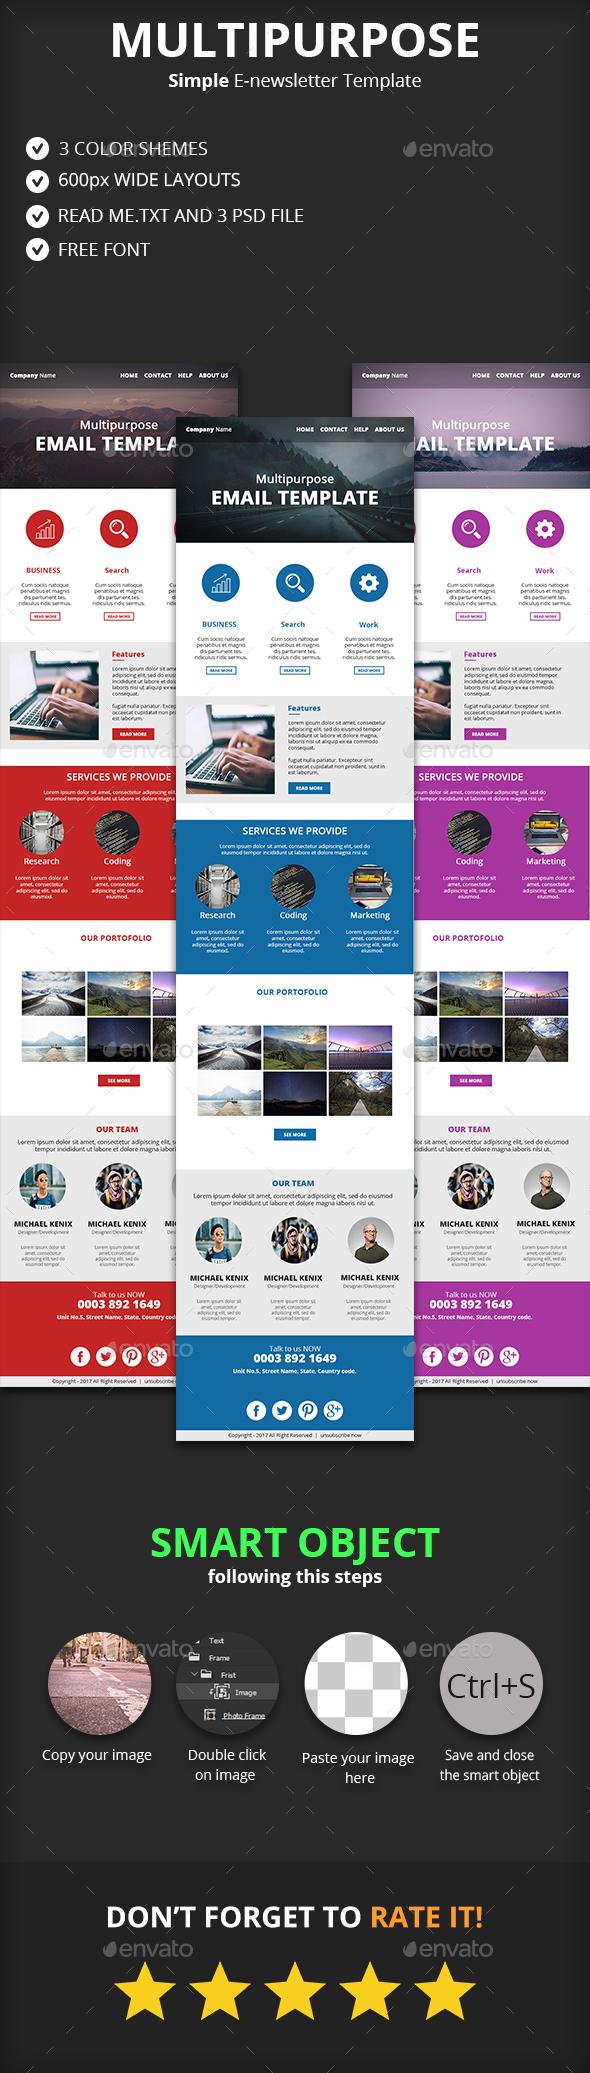 Simple Multipurpose E-newsletter Template - E-newsletters Web Elements